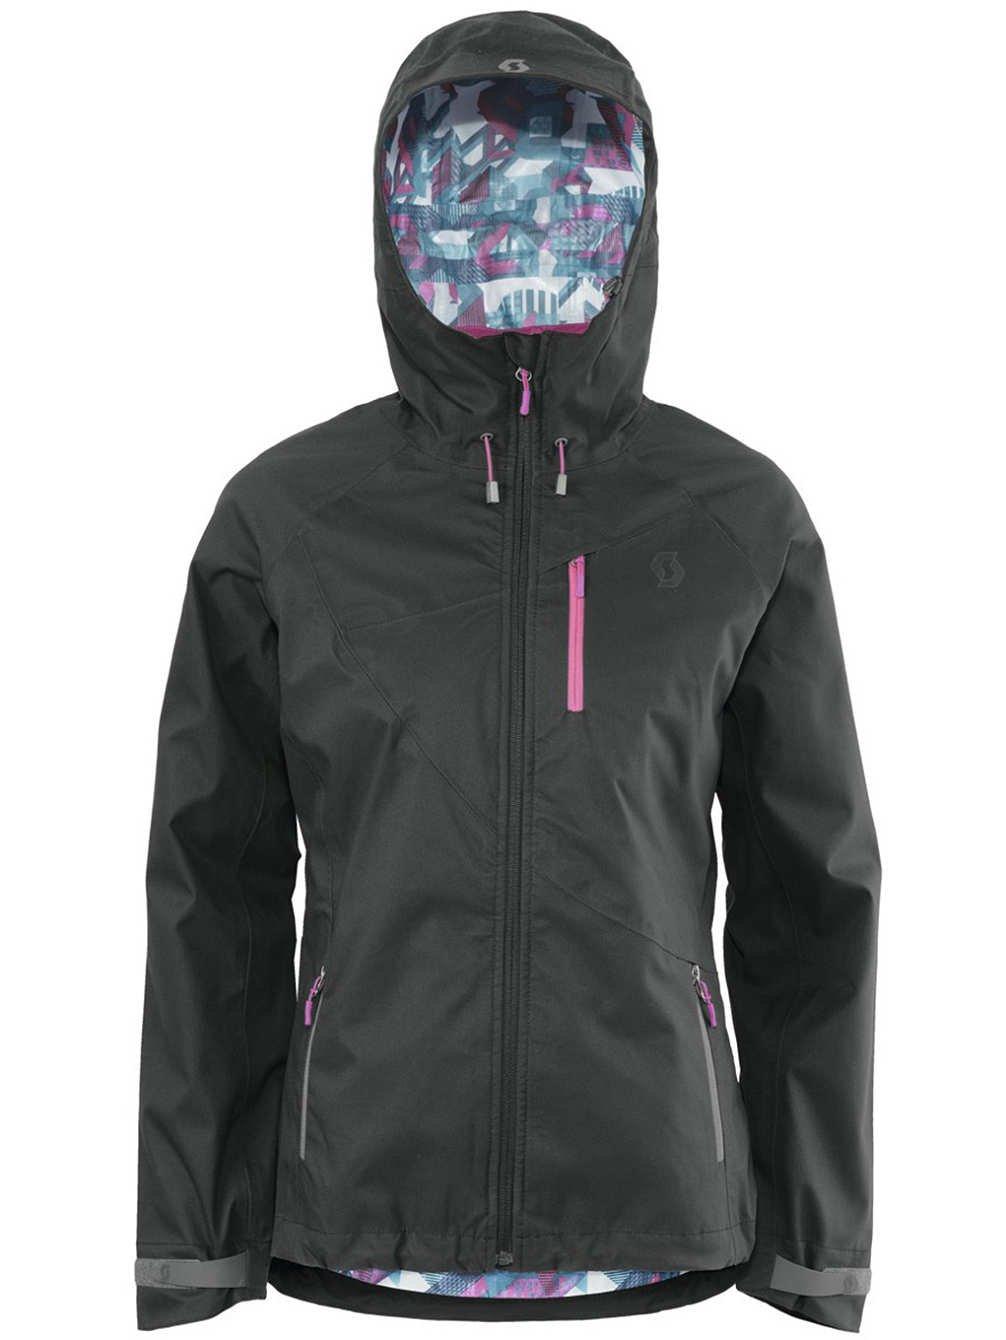 Damen Snowboard Jacke Scott Sesvenna Jacket bestellen